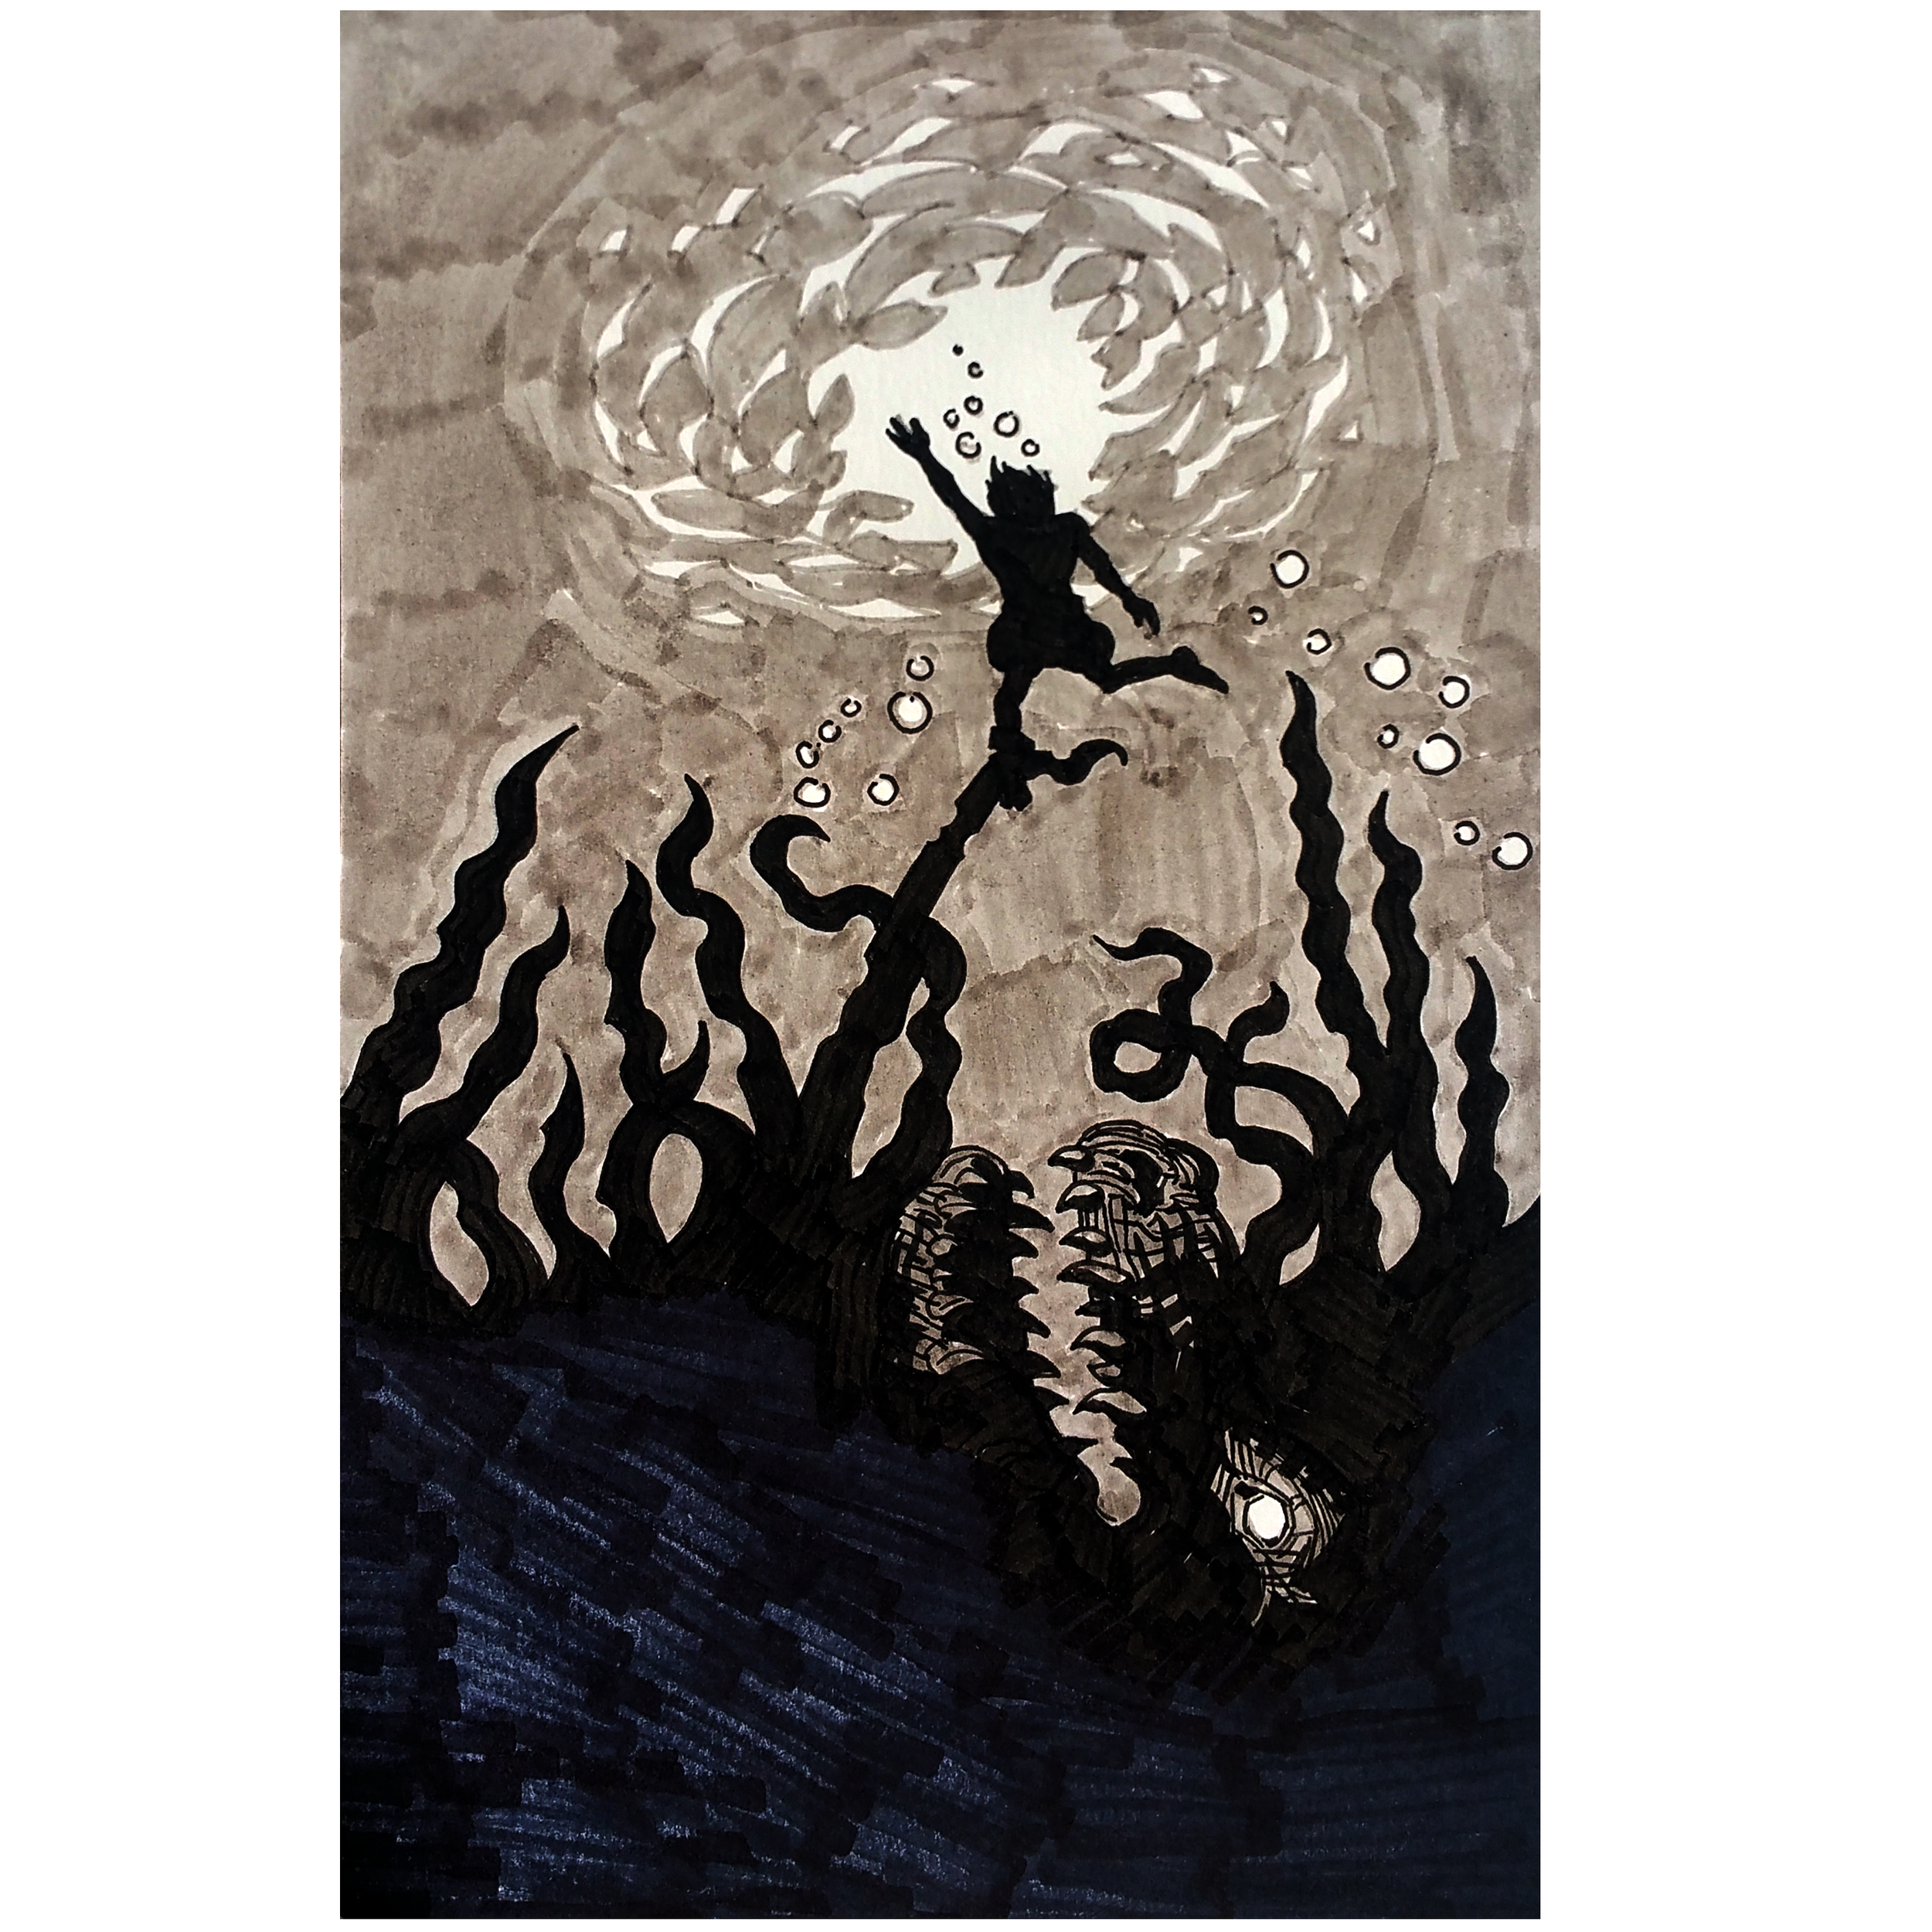 04_Underwater.png